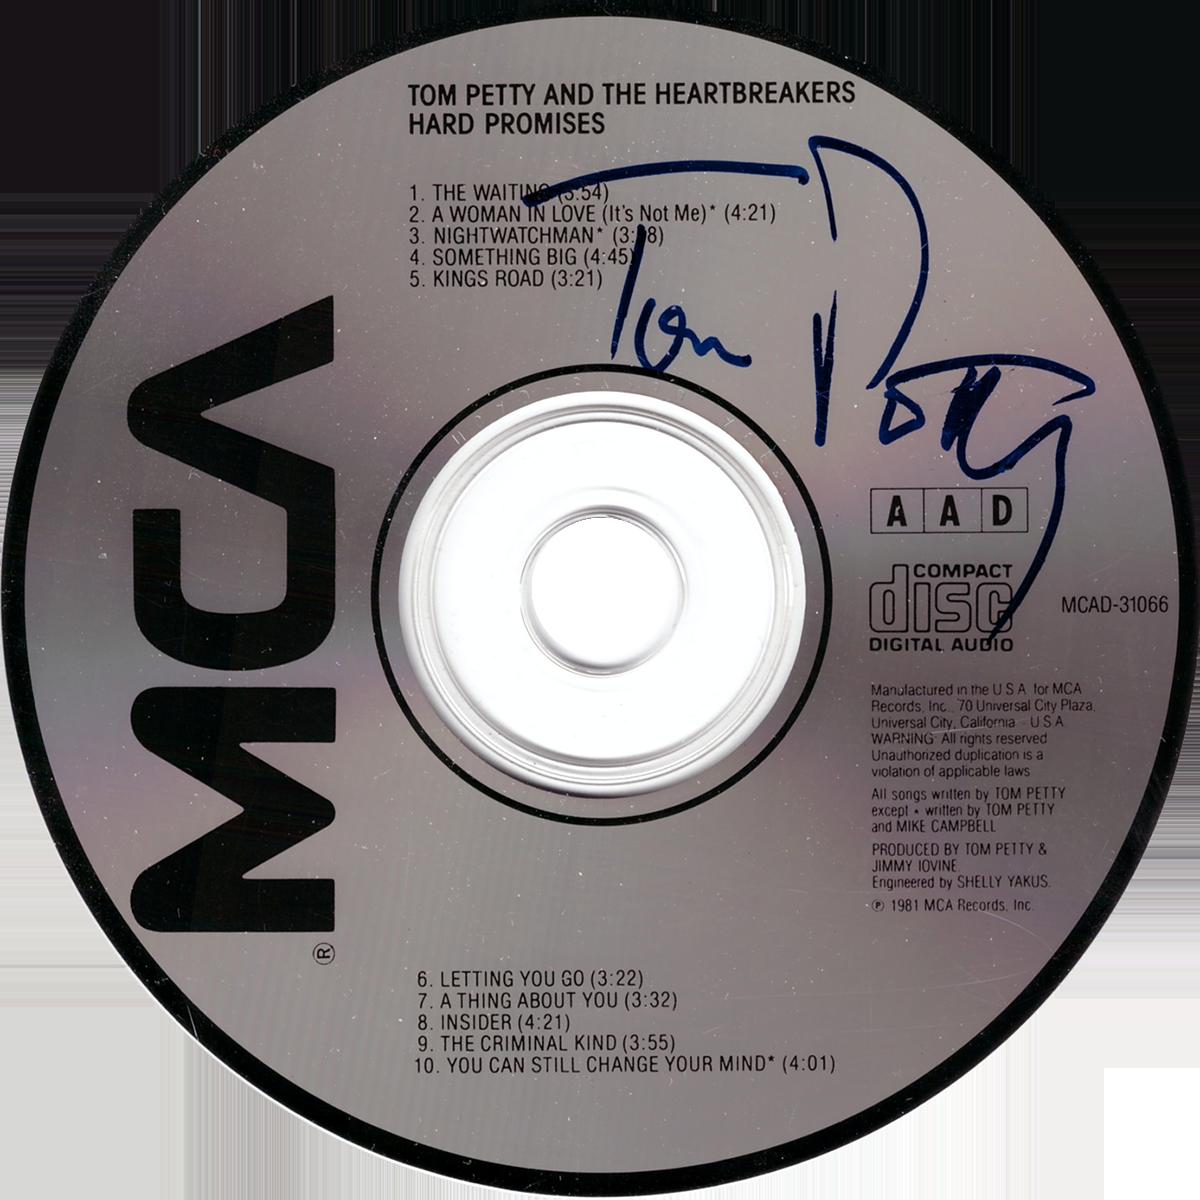 Tom Petty CD - Hard Promises